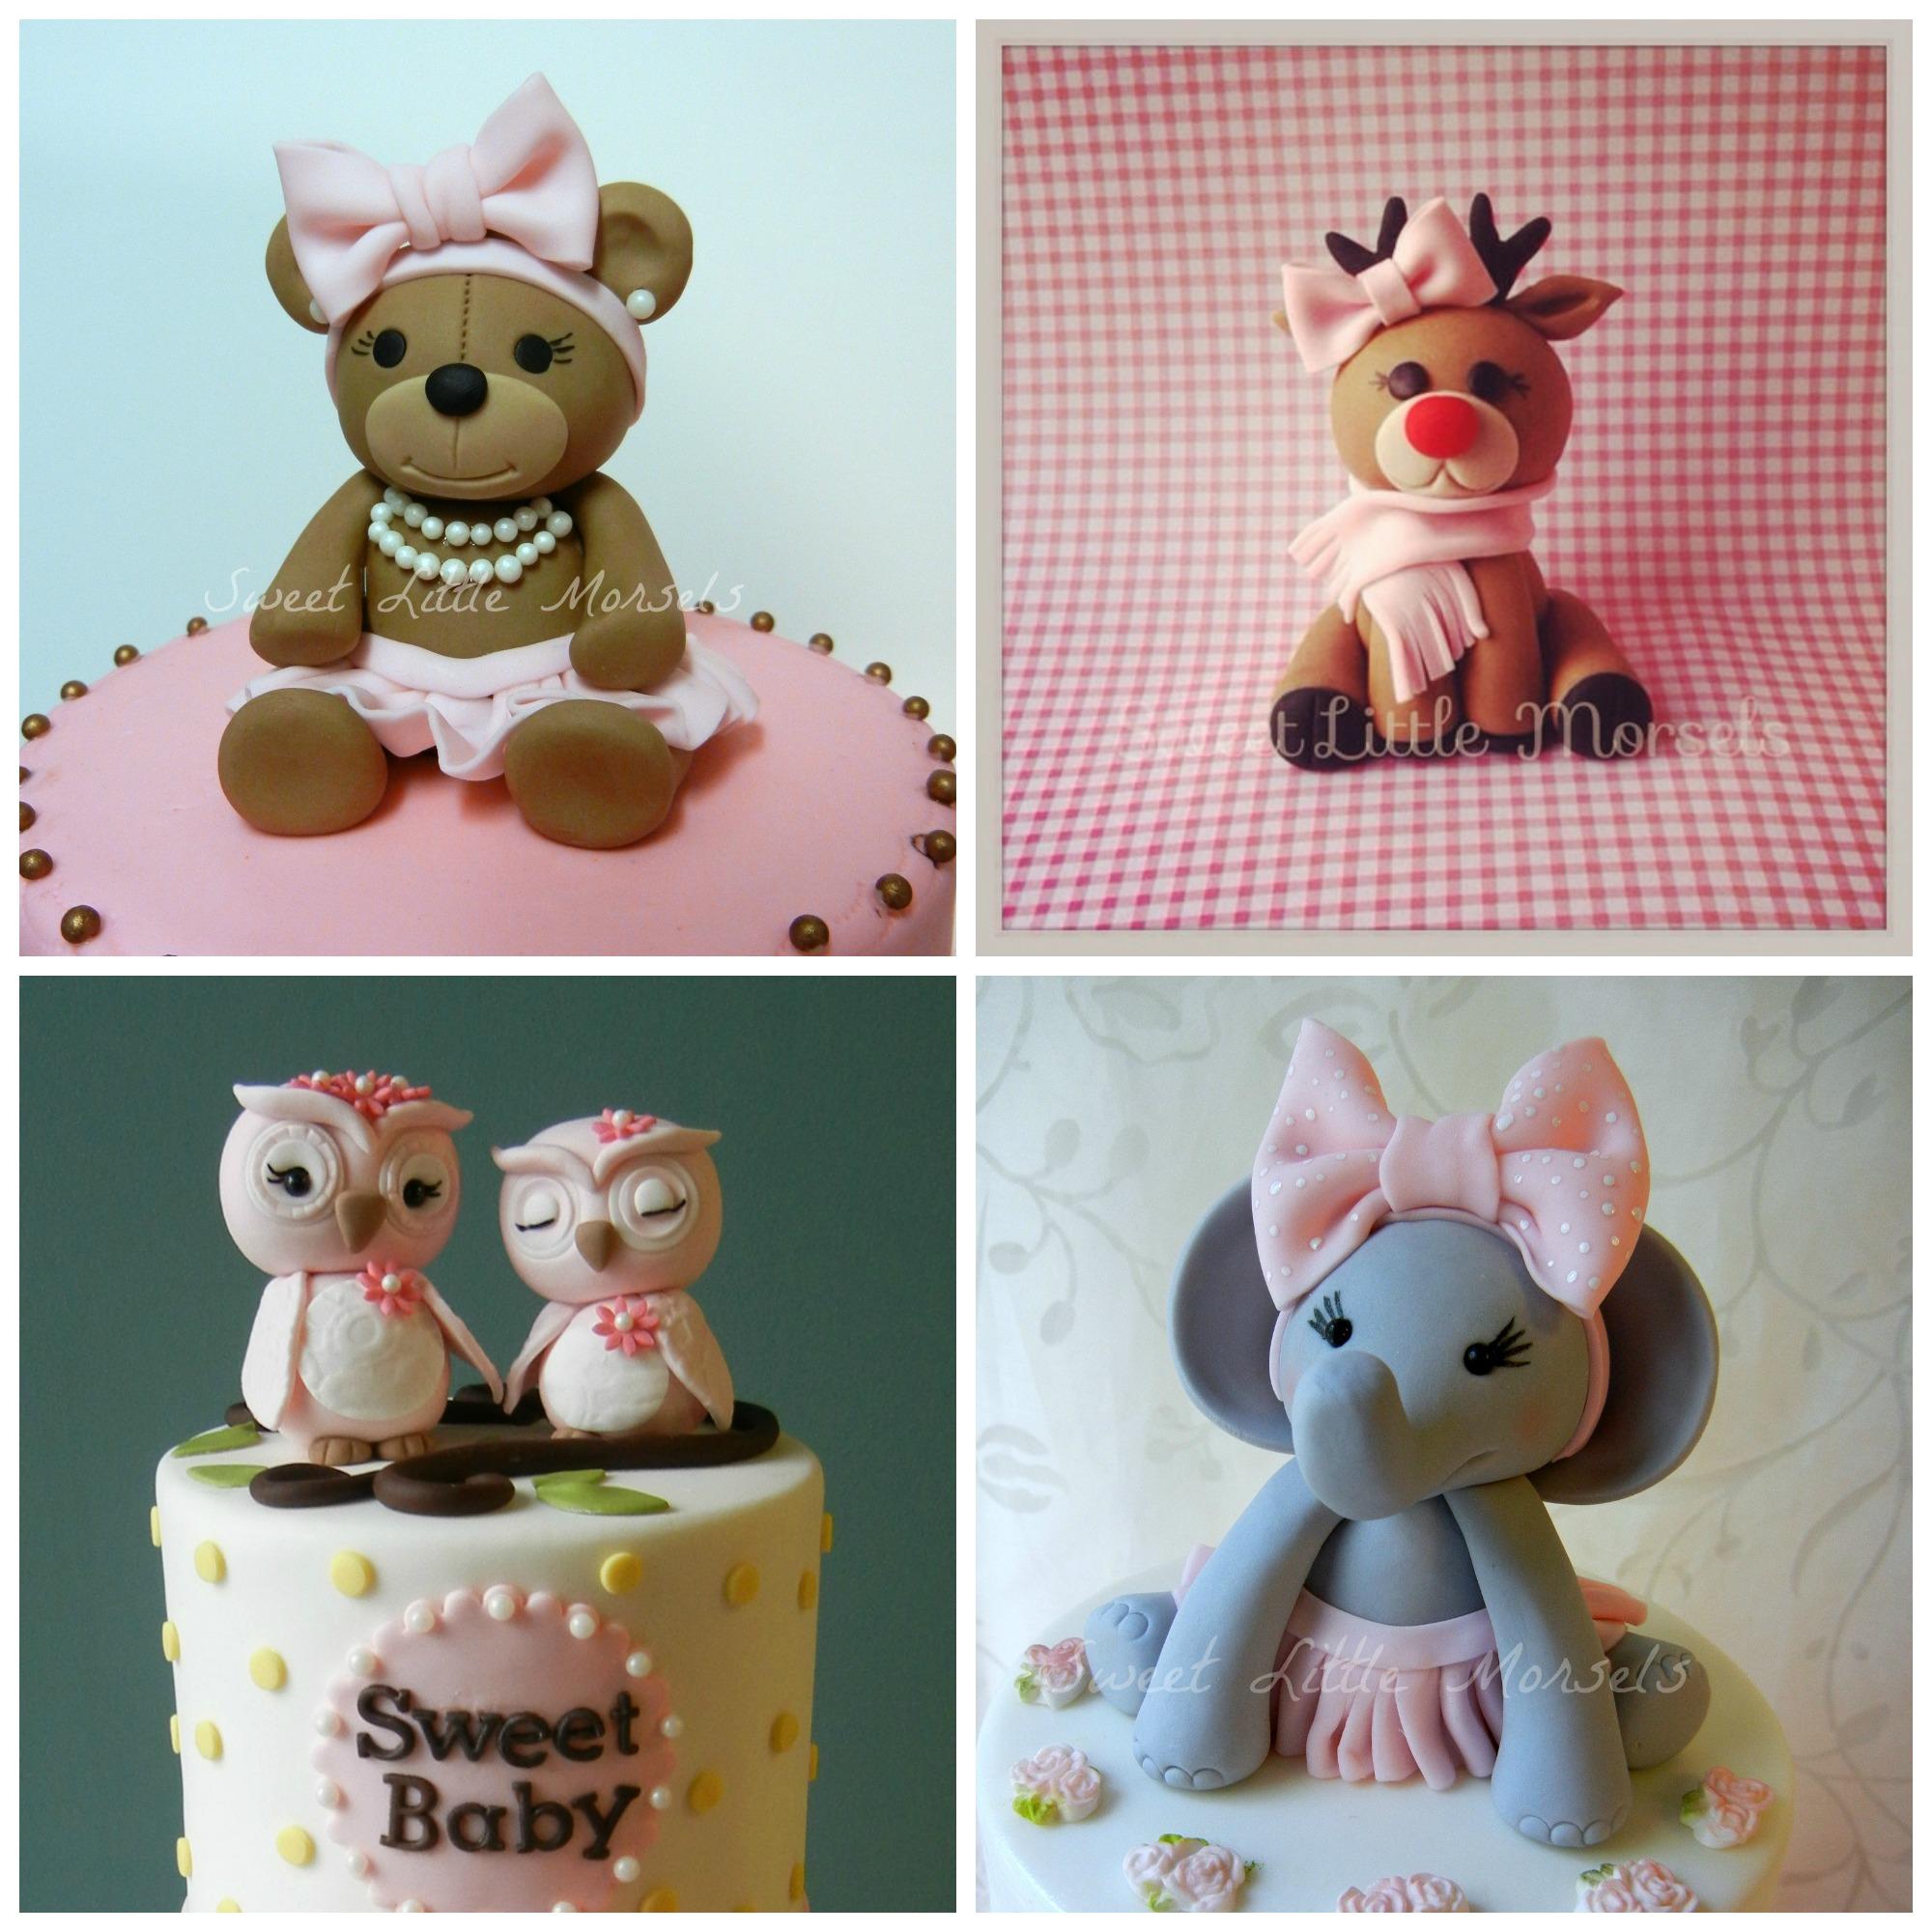 Sweet Little Morsels LLC